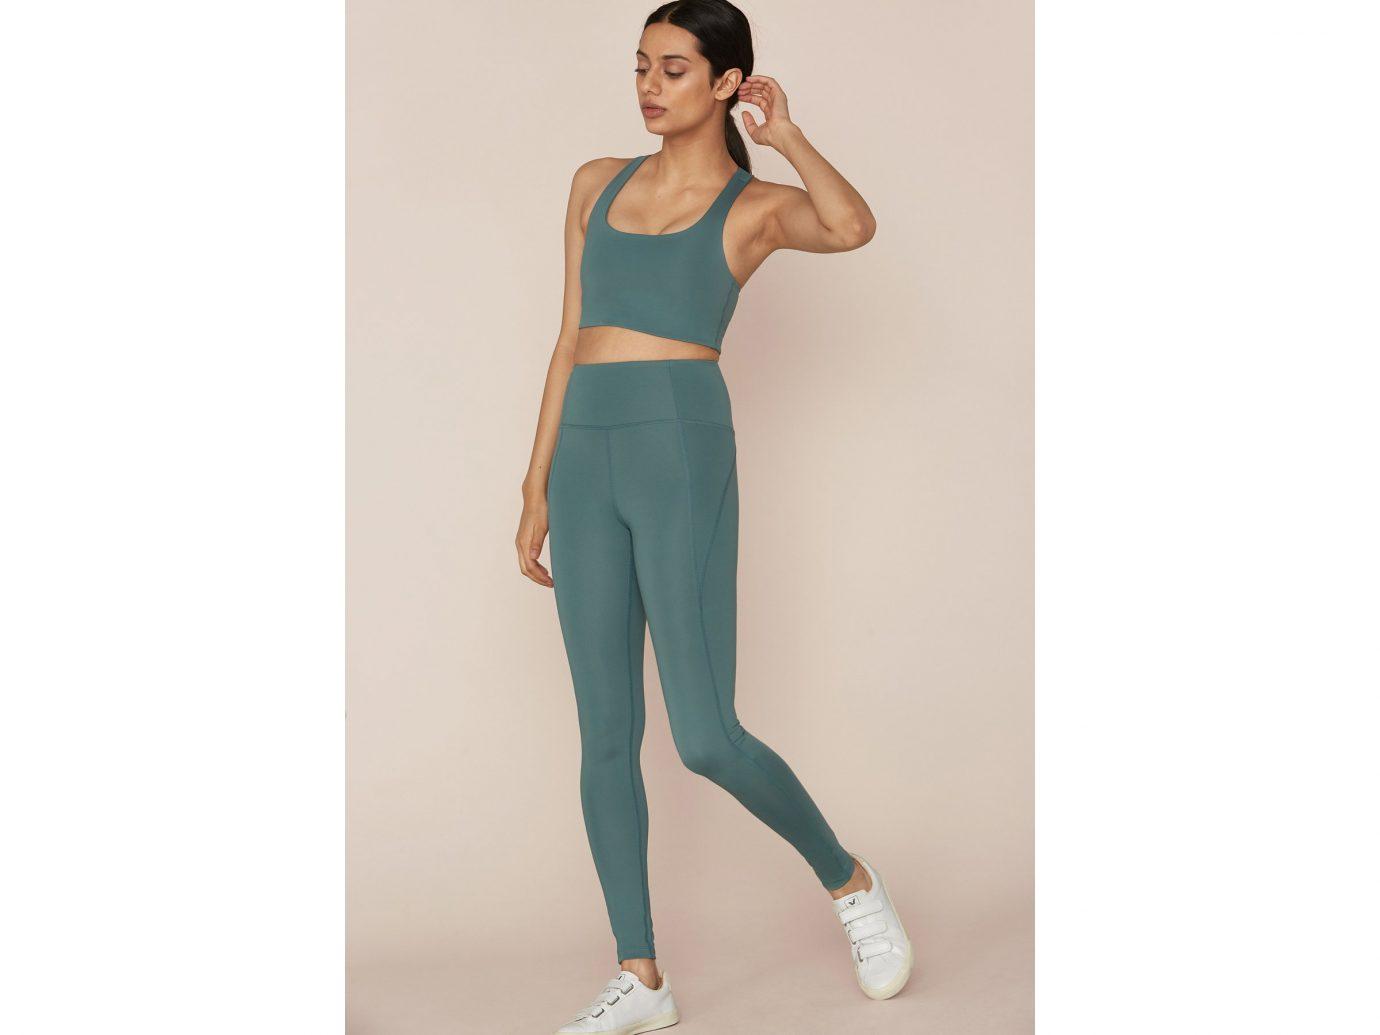 Girlfriend Collective Jade Compressive High-Rise Legging